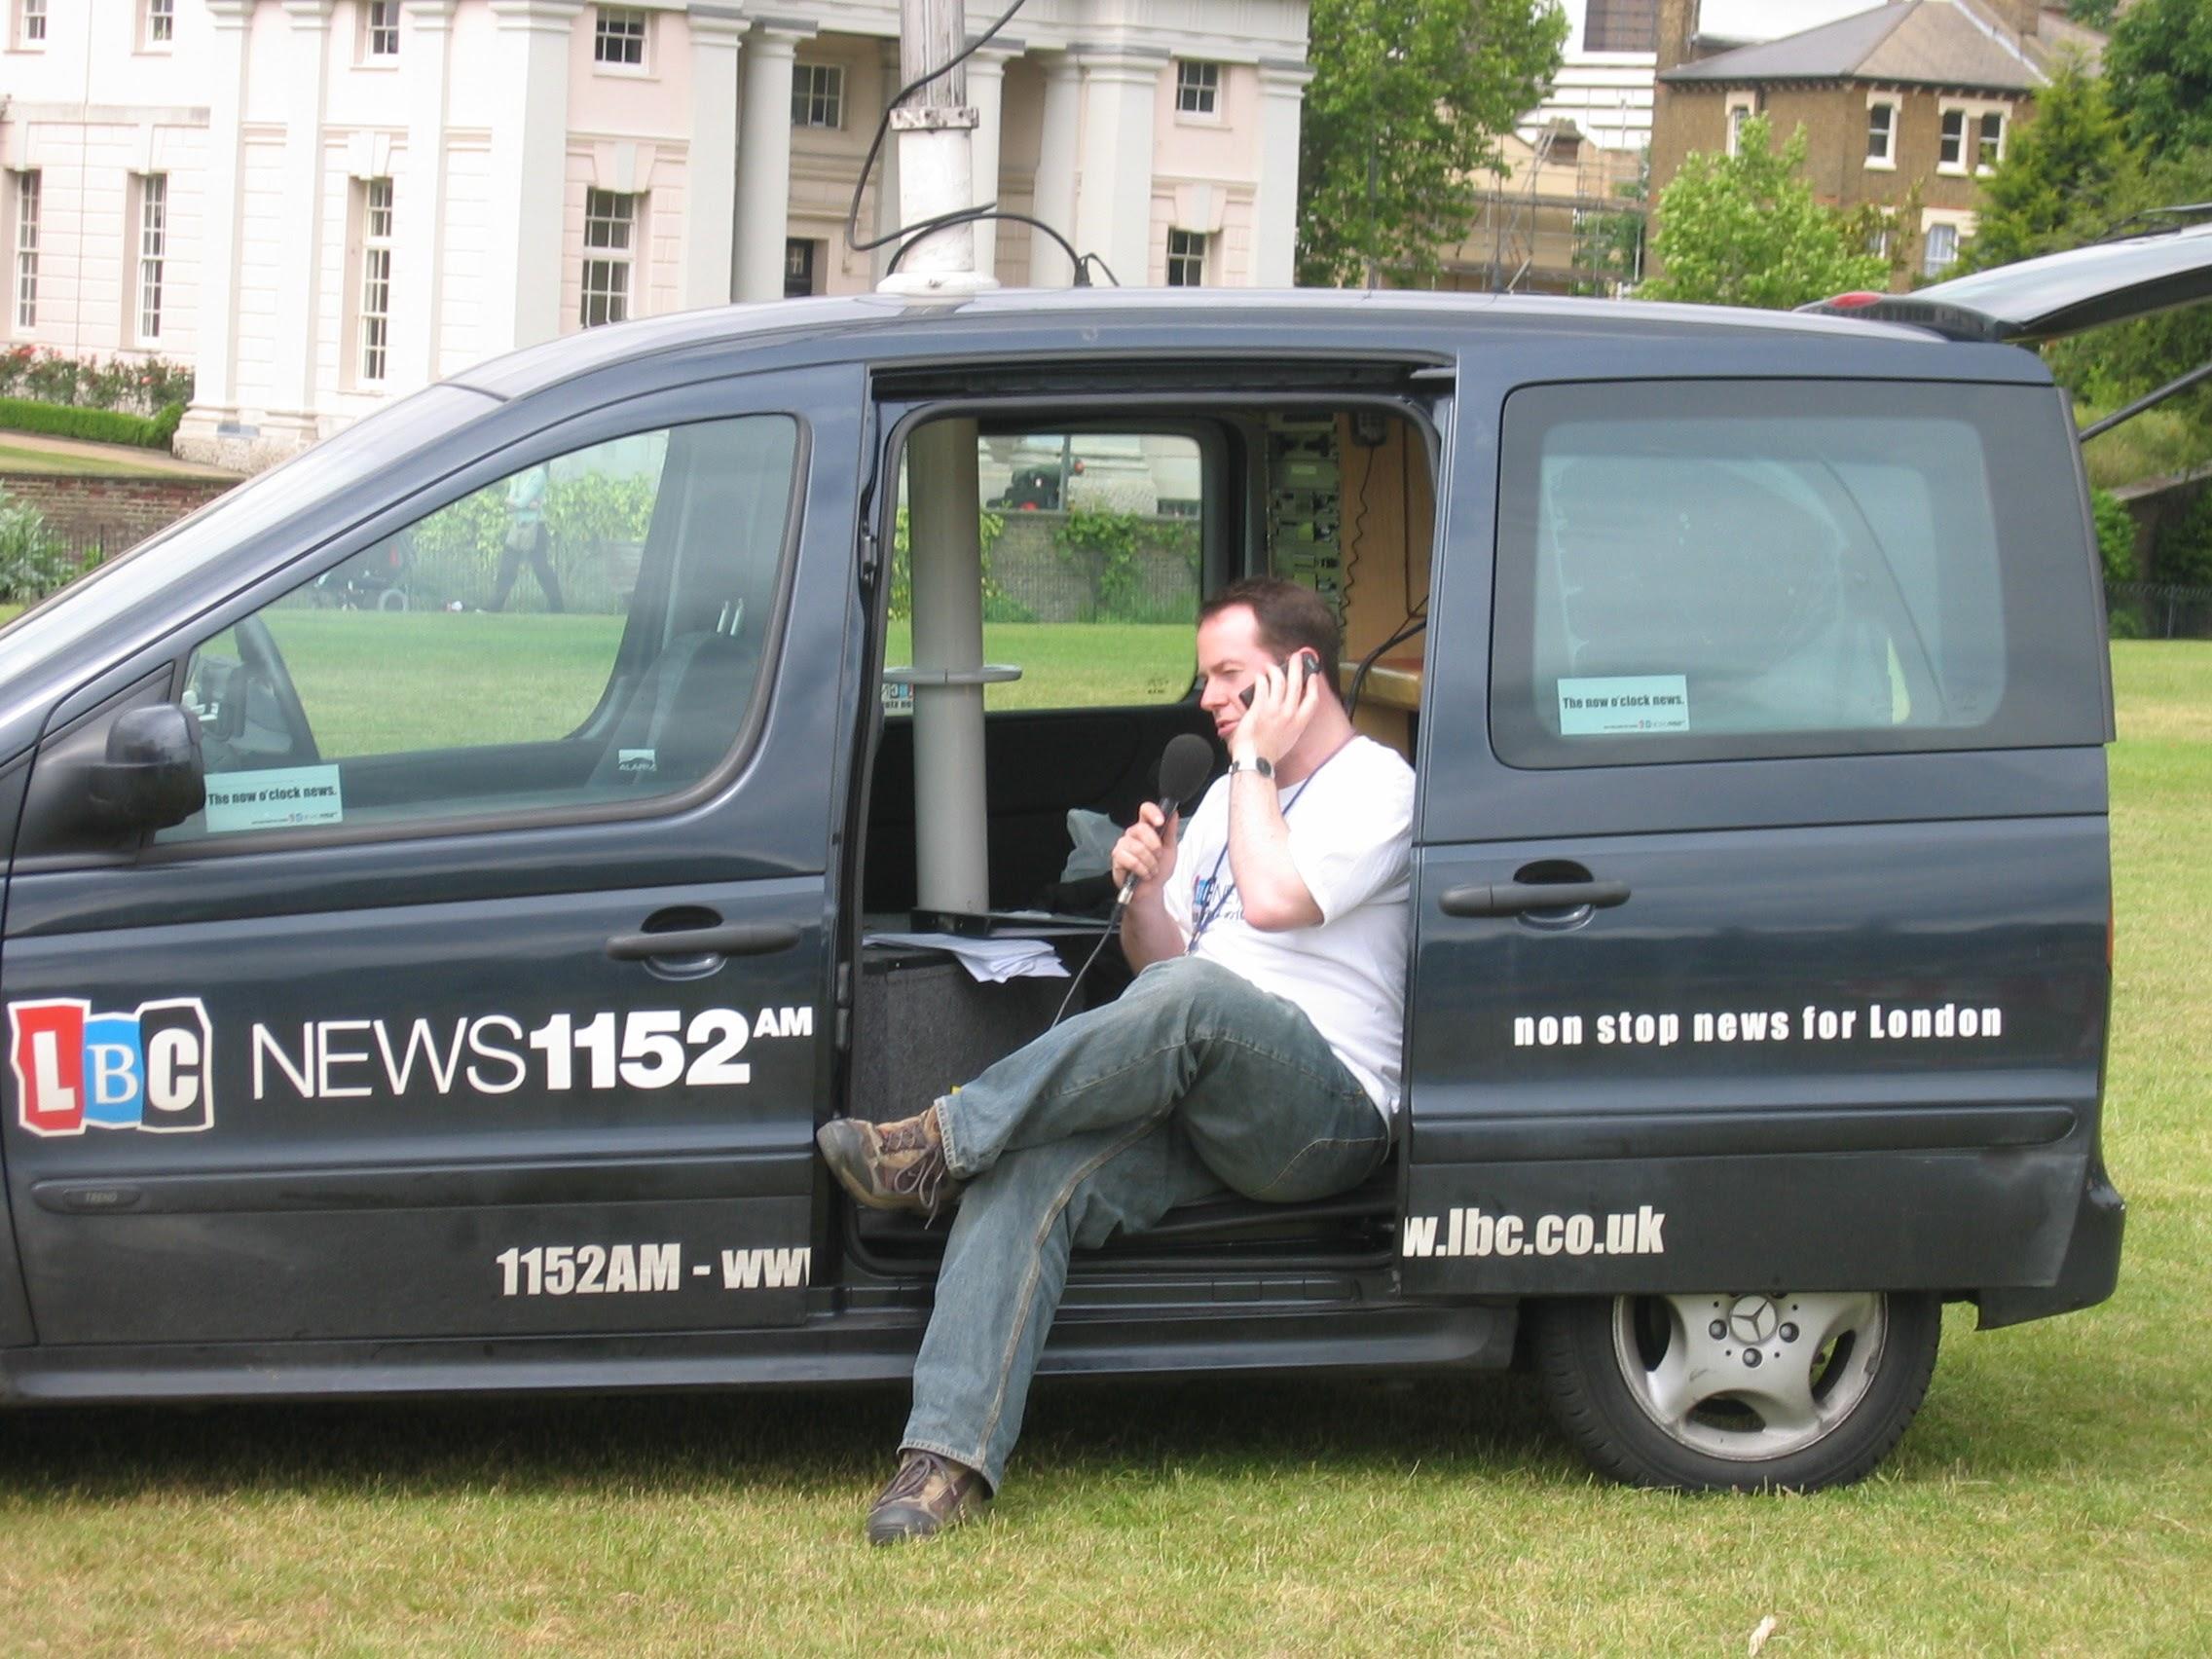 Richard Midson LBC News 1152